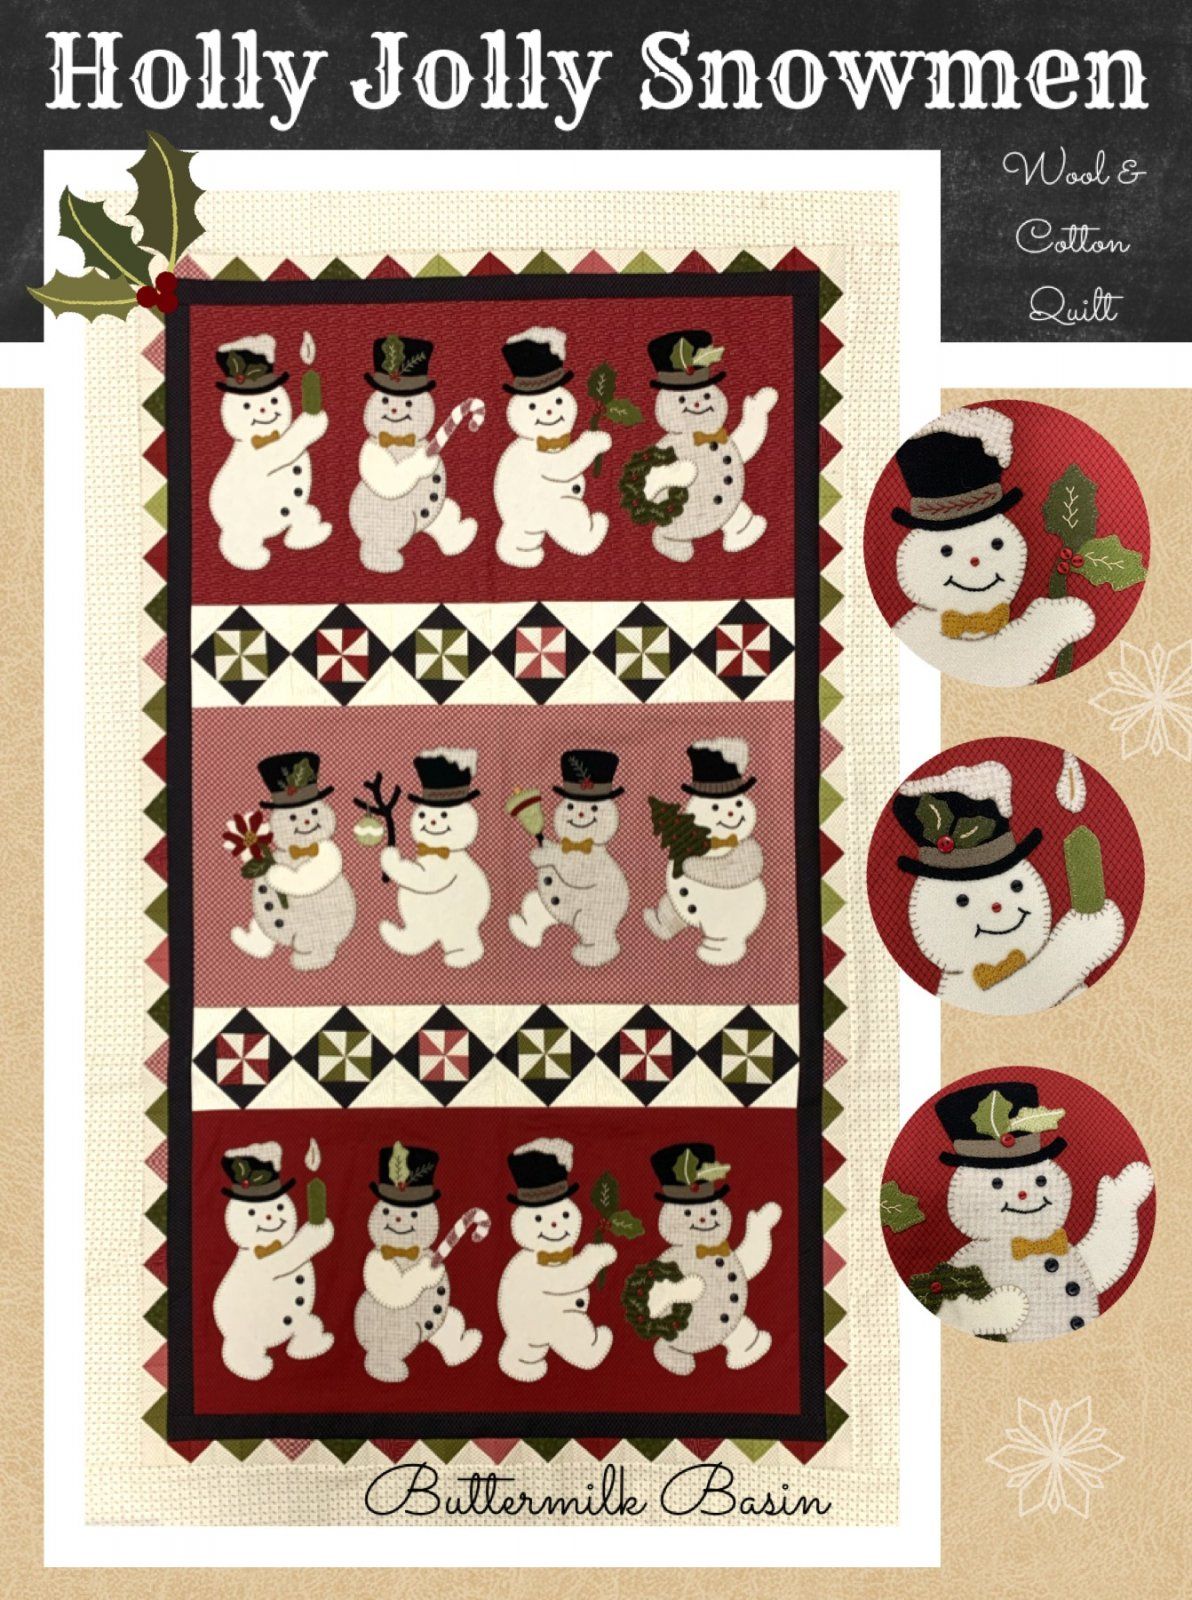 Holly Jolly Snowmen Wool & Cotton Quilt * KIT & Pattern